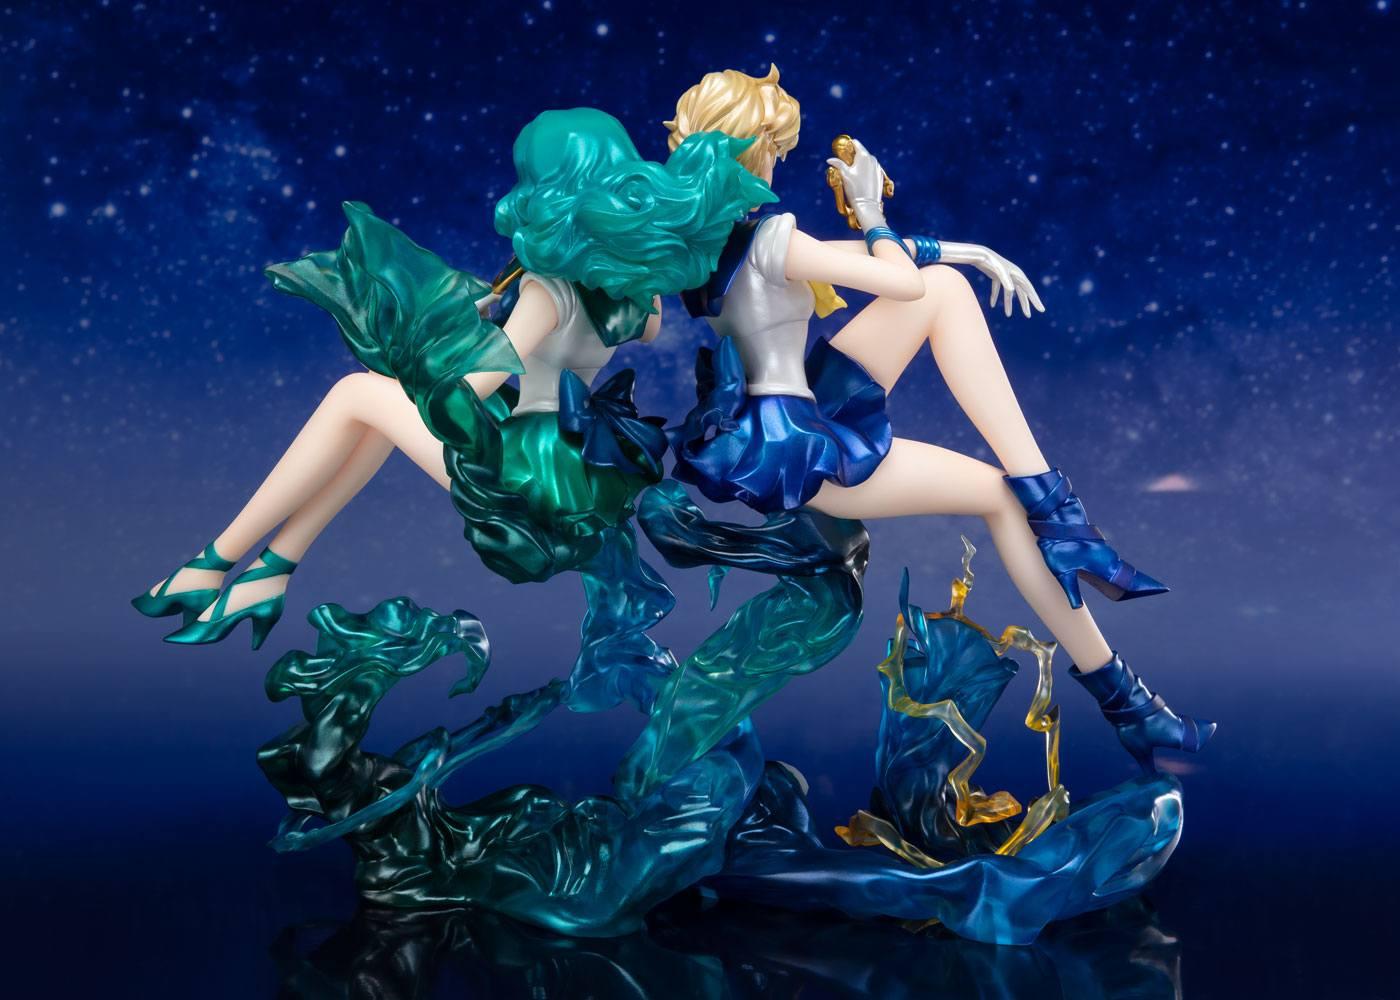 Sailor Moon FiguartsZERO Chouette PVC Statue Sailor Neptun & Sailor Uranus Web Exclusive Set